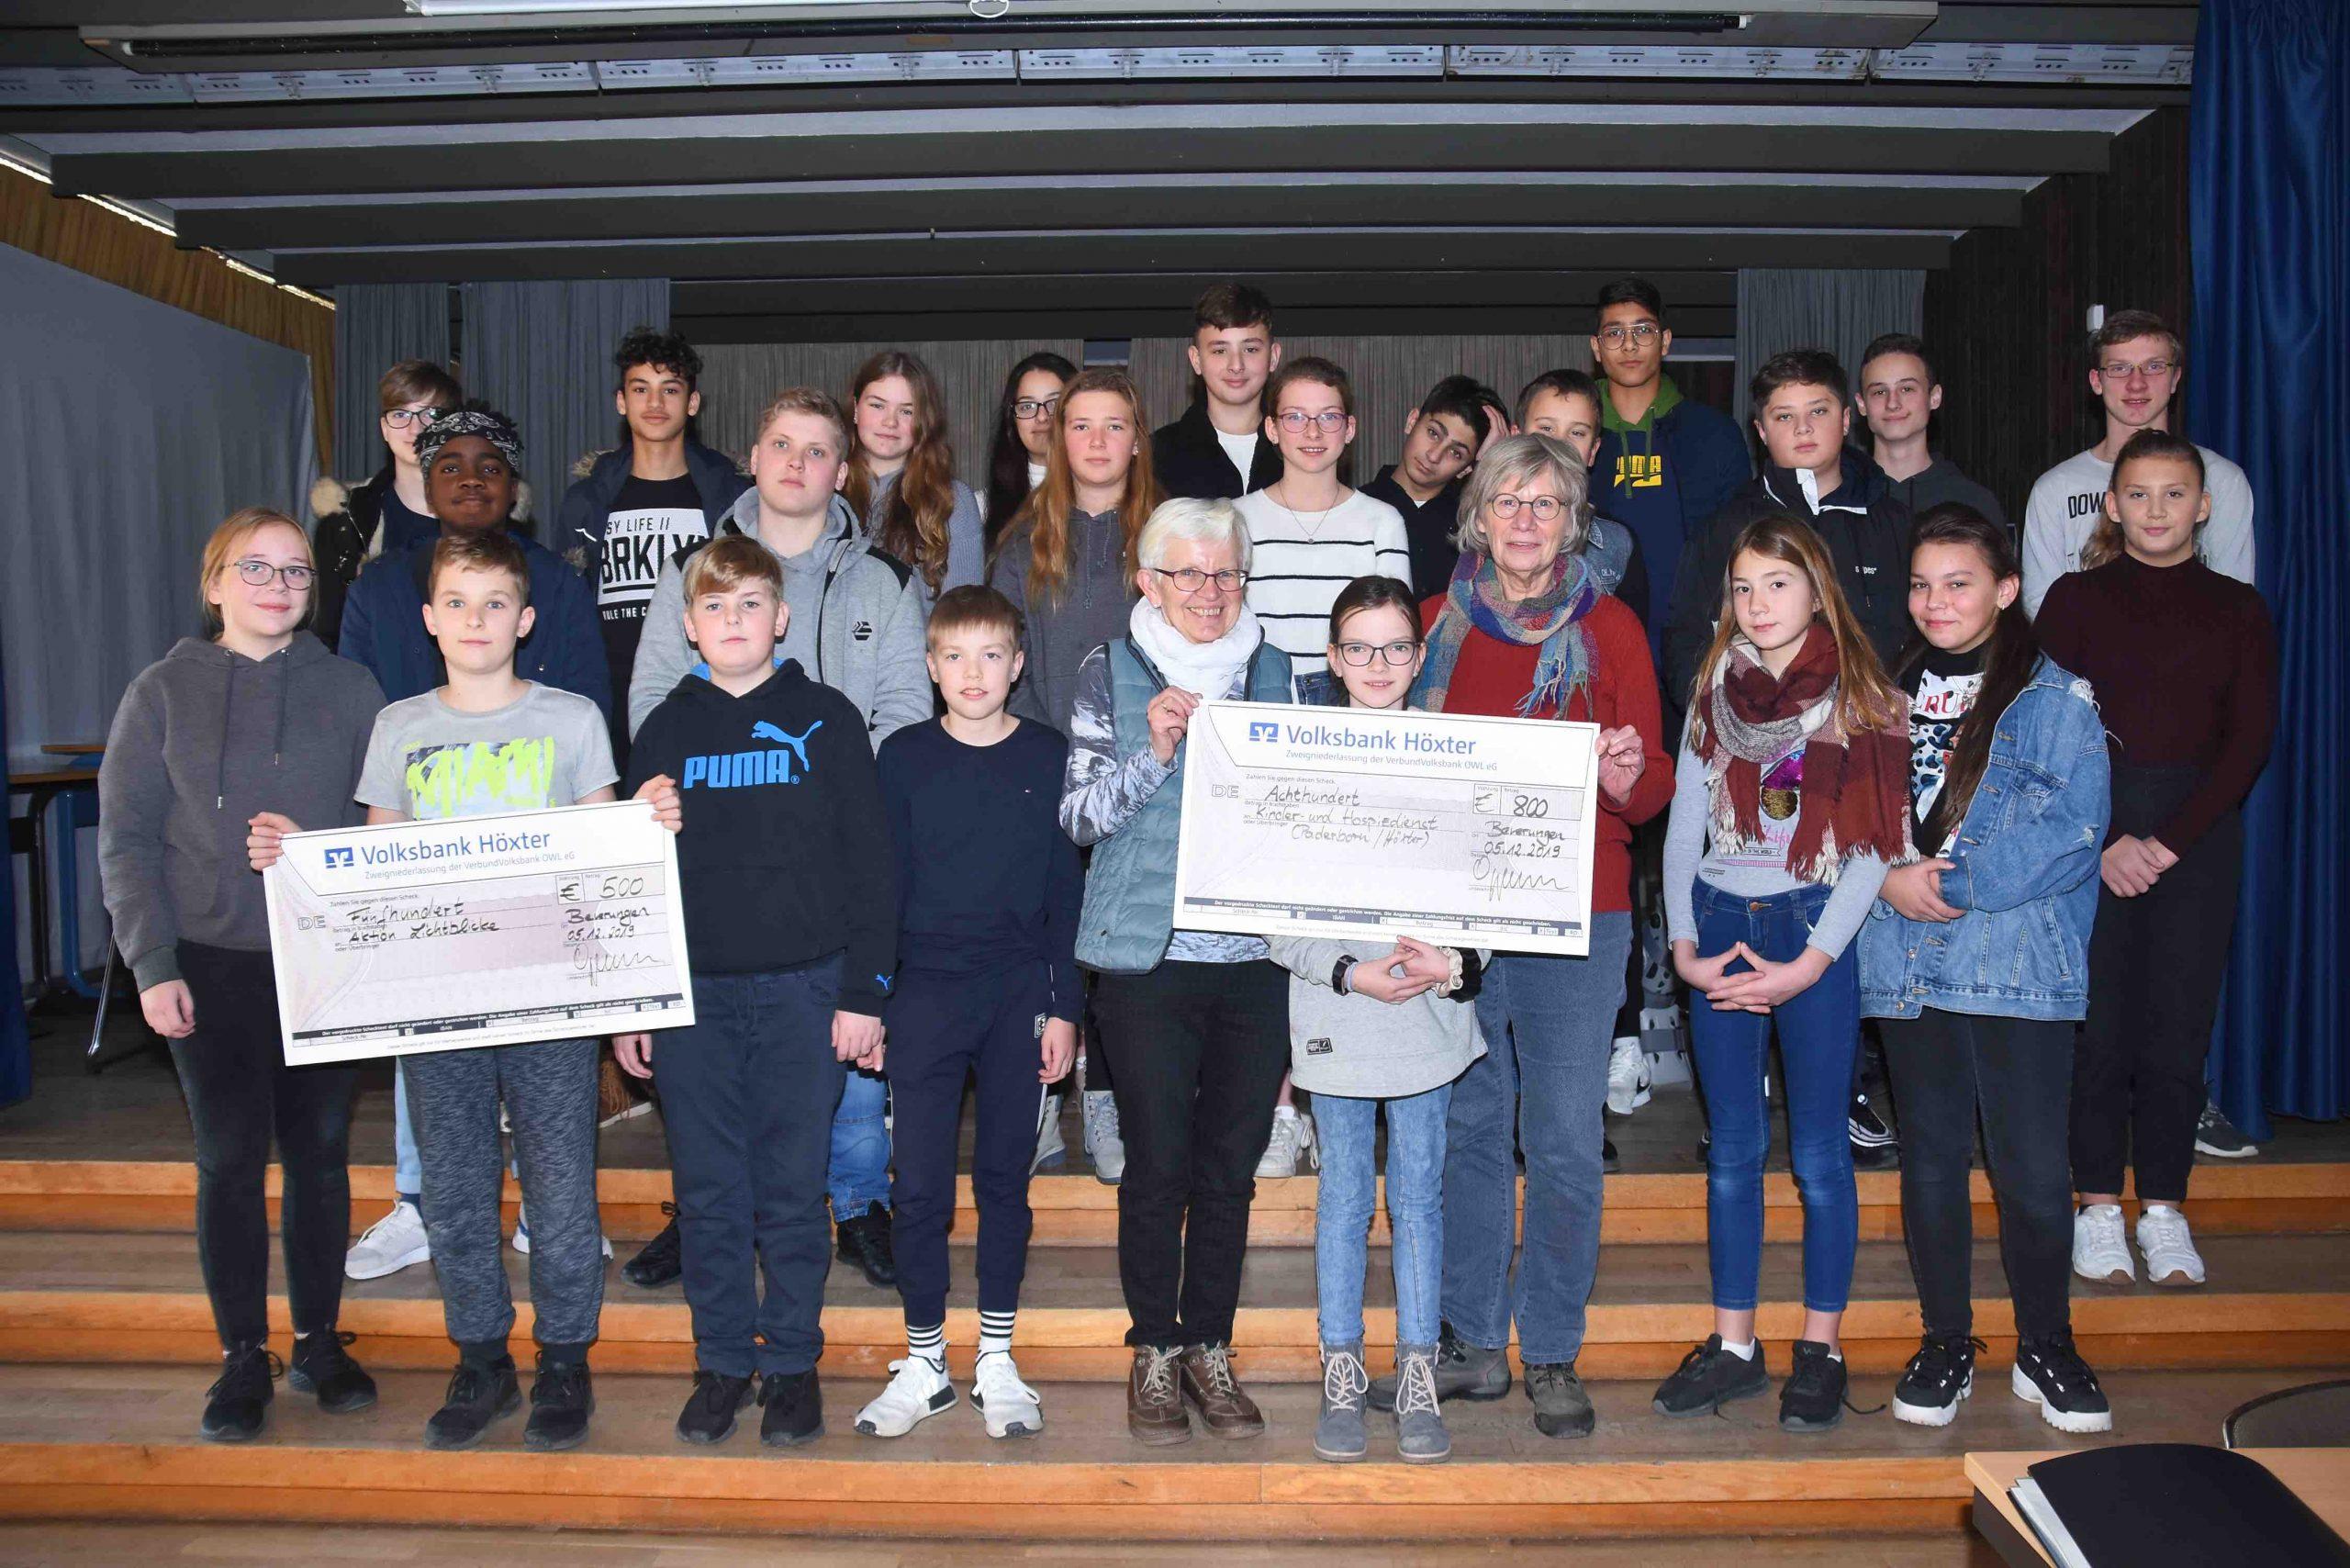 Sekundarschüler spenden 1.300 Euro